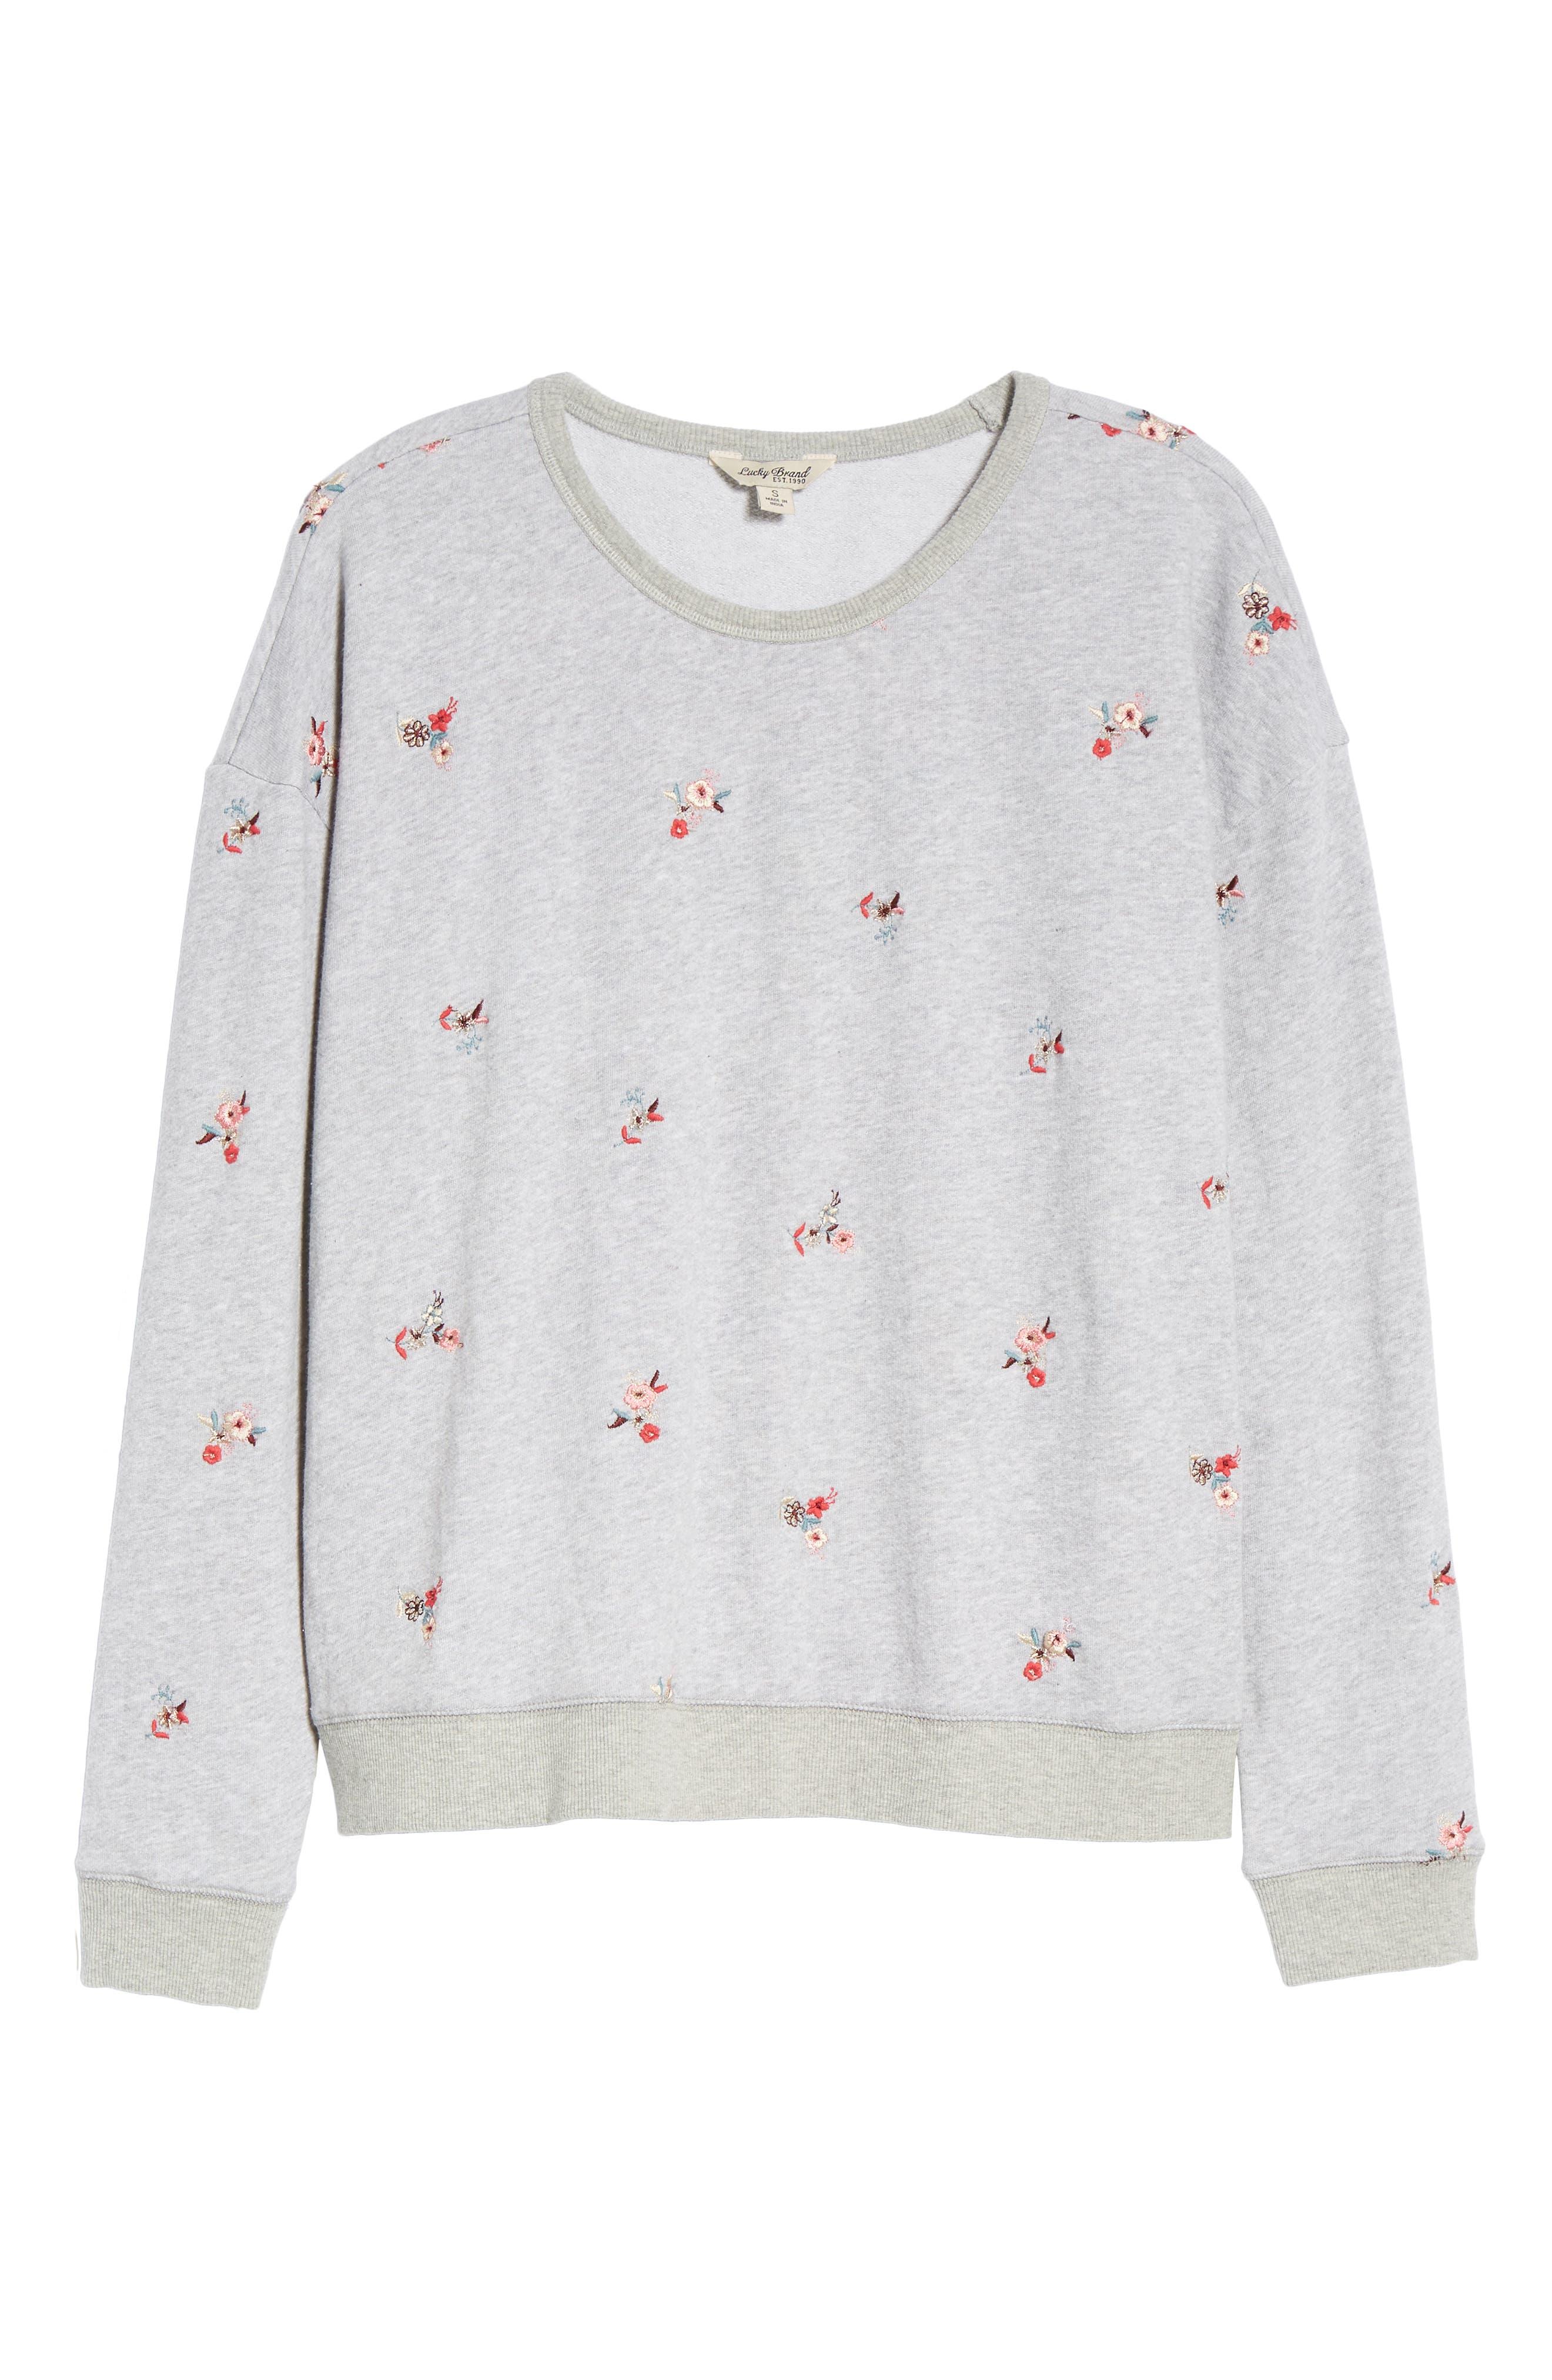 Embroidered Flowers Sweatshirt,                             Alternate thumbnail 6, color,                             030